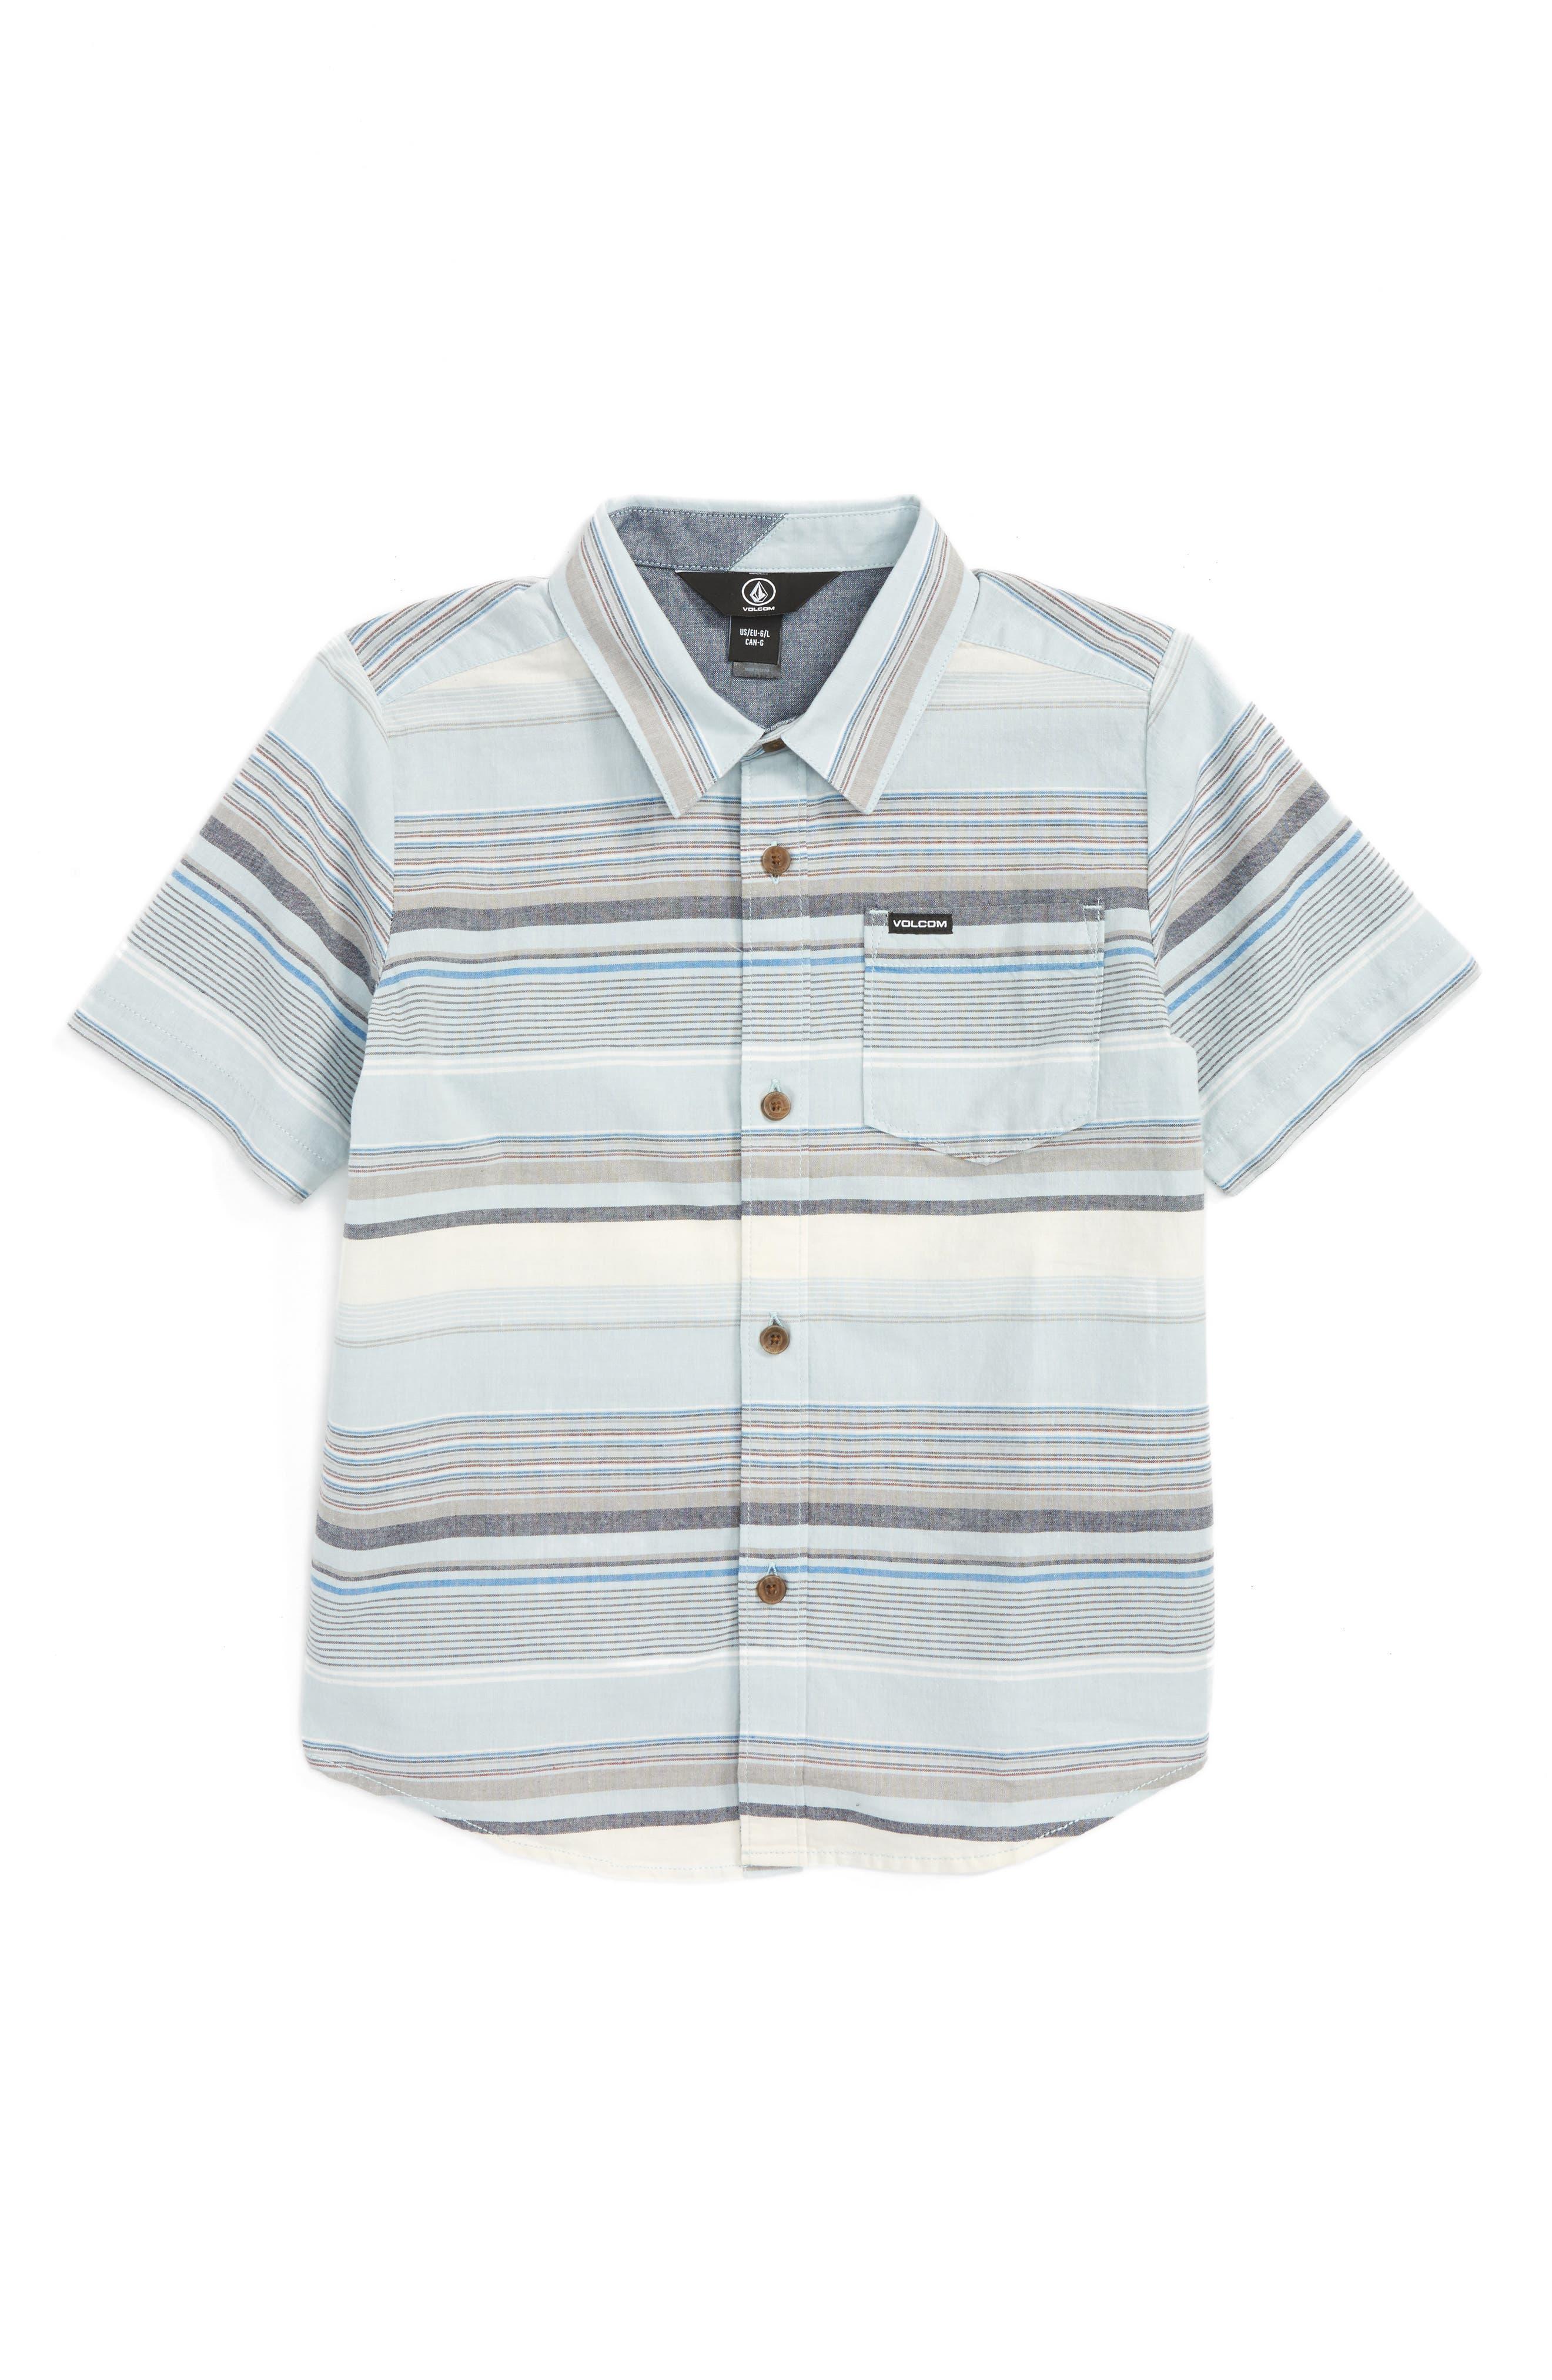 Volcom Rambler Woven Shirt (Toddler Boys & Little Boys)